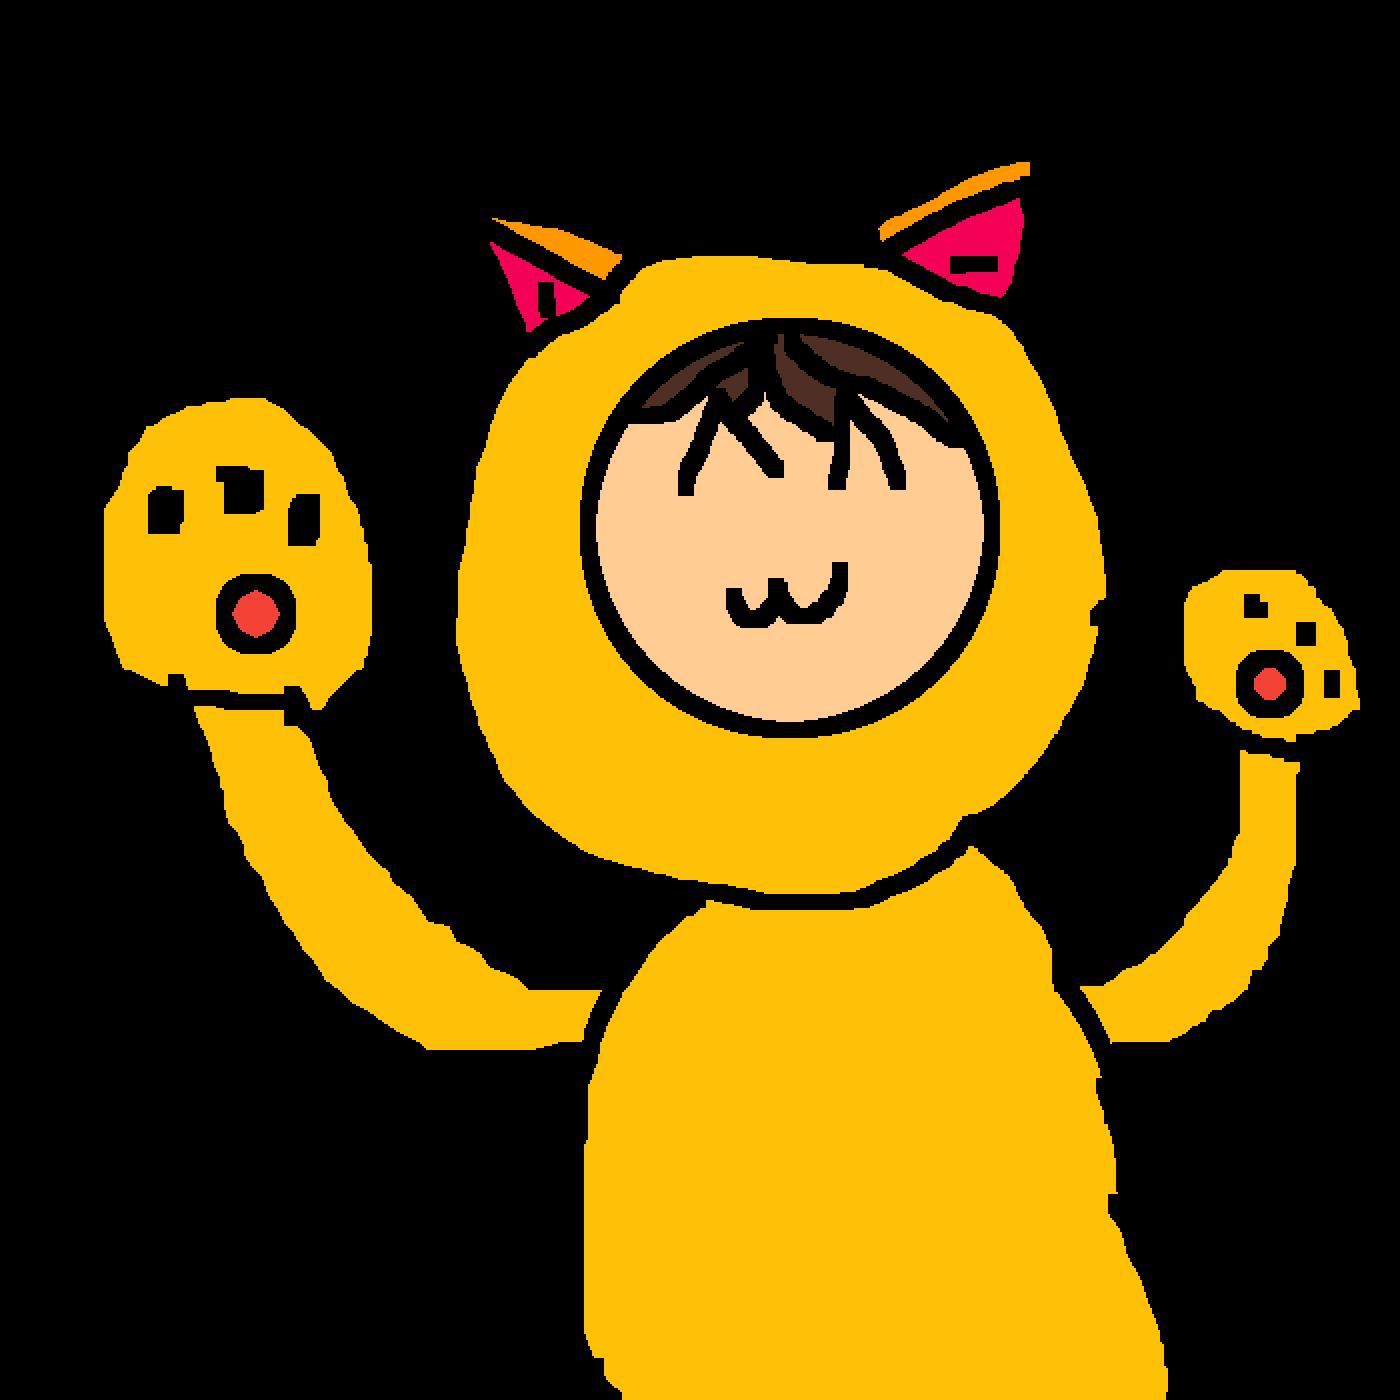 main-image-the perrrrrrrrrrrrrrrrrrrrfect cat costume  by art-cat